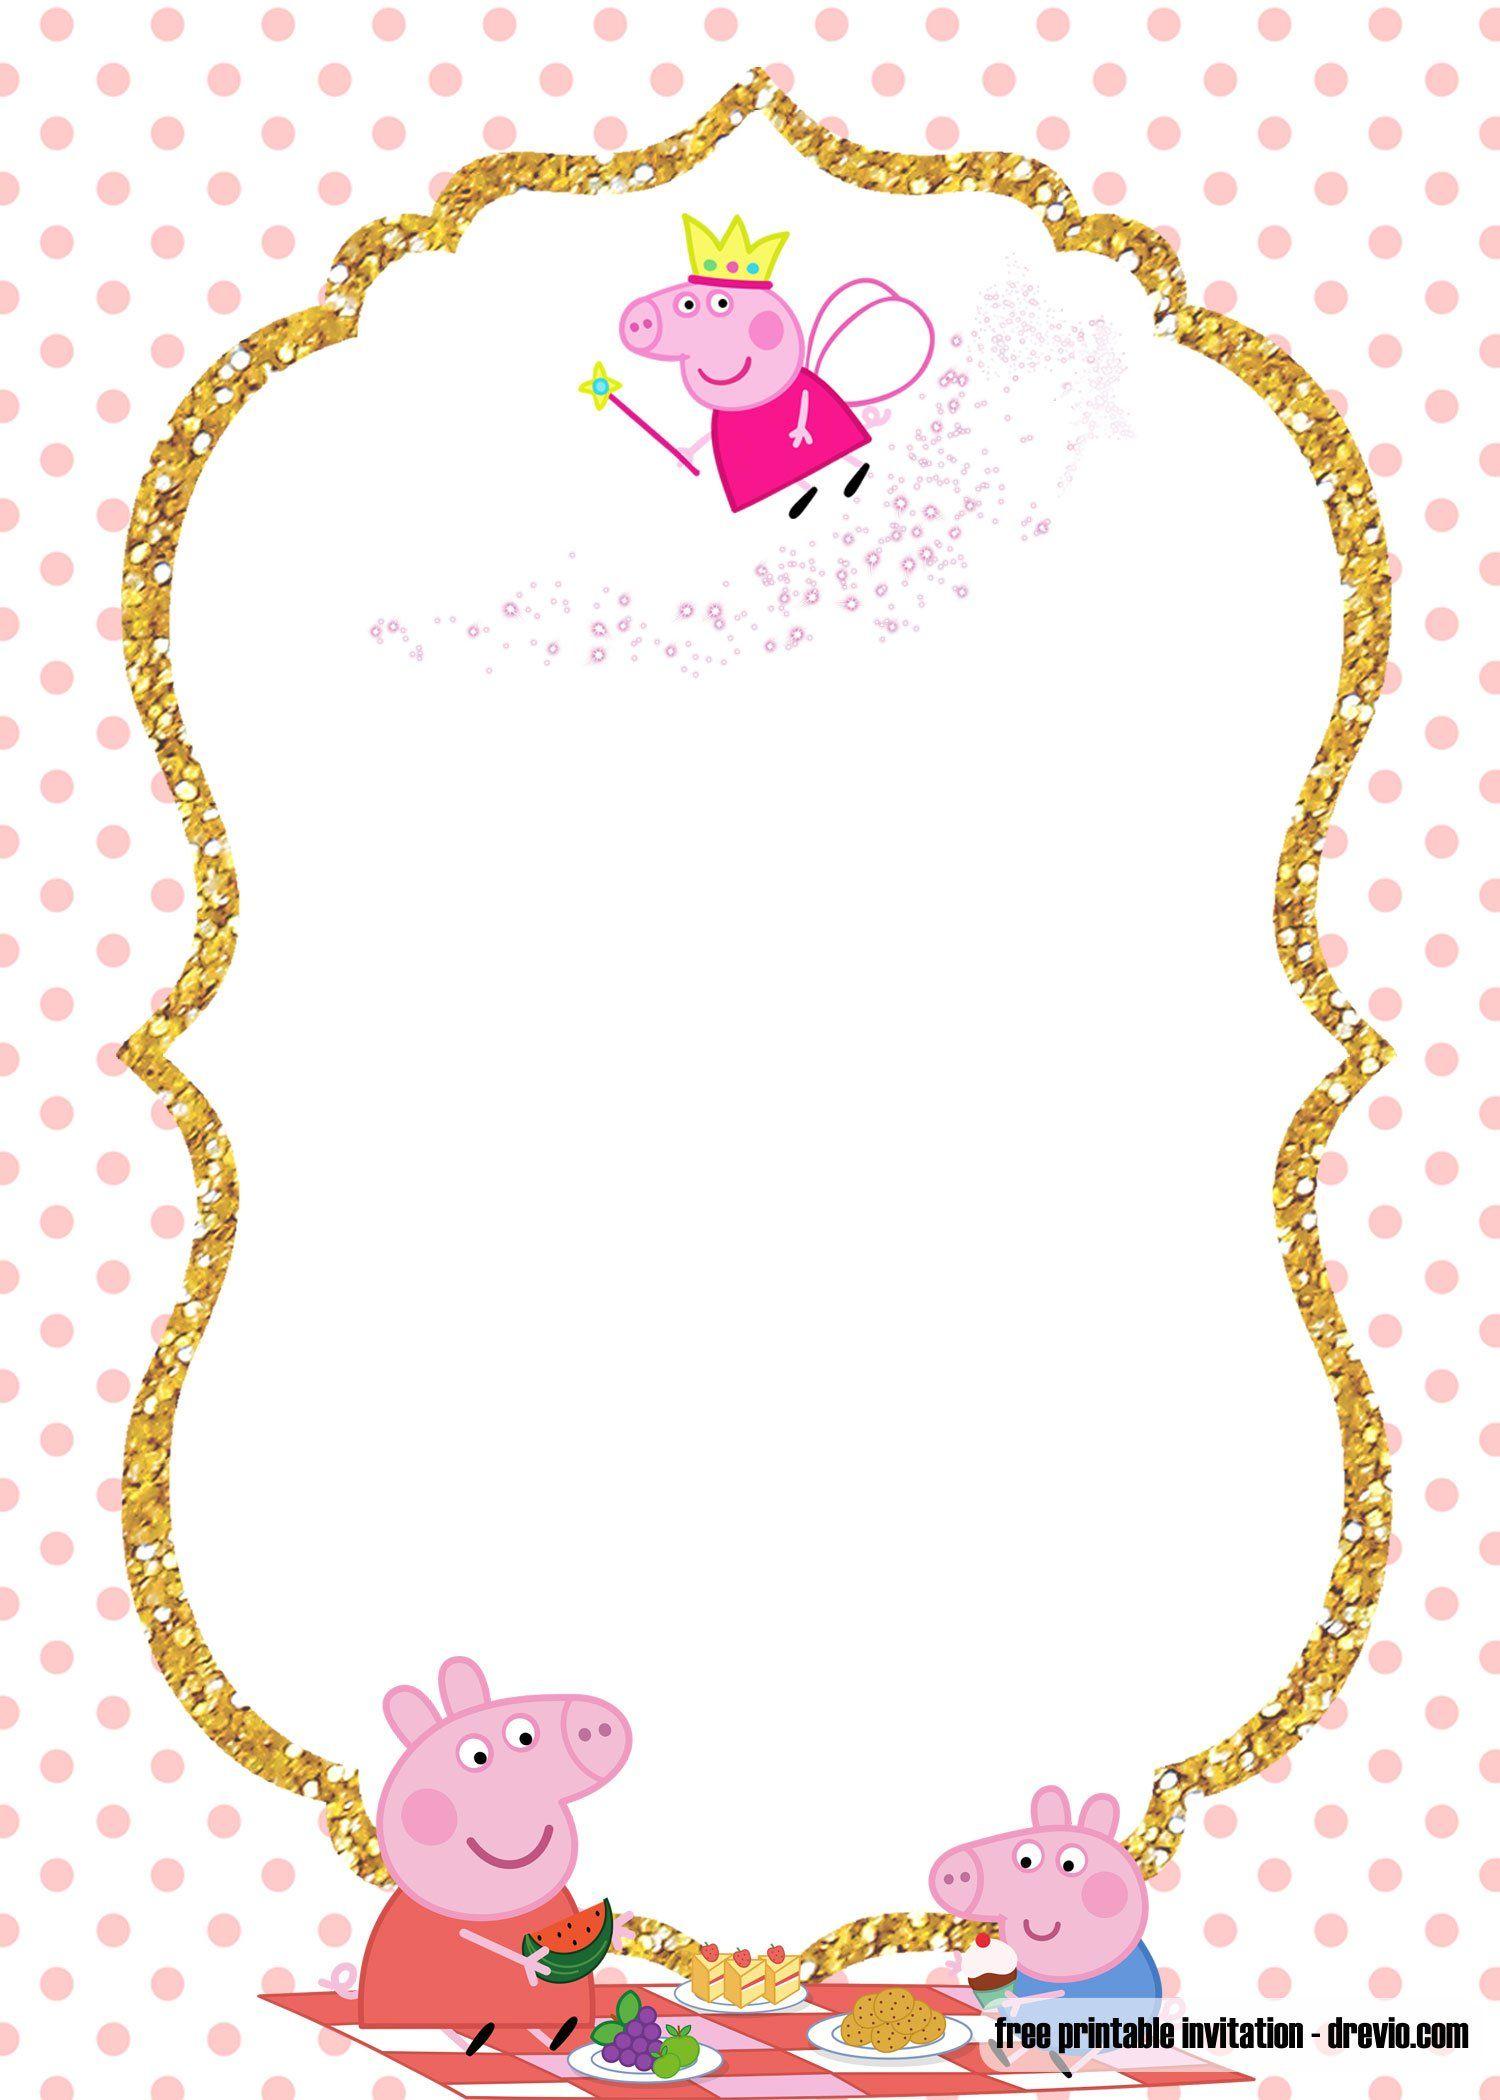 Free Printable Peppa Pig Invitation Template In 2021 Peppa Pig Invitations Pig Invitation Peppa Pig Birthday Invitations Peppa pig invitation template free